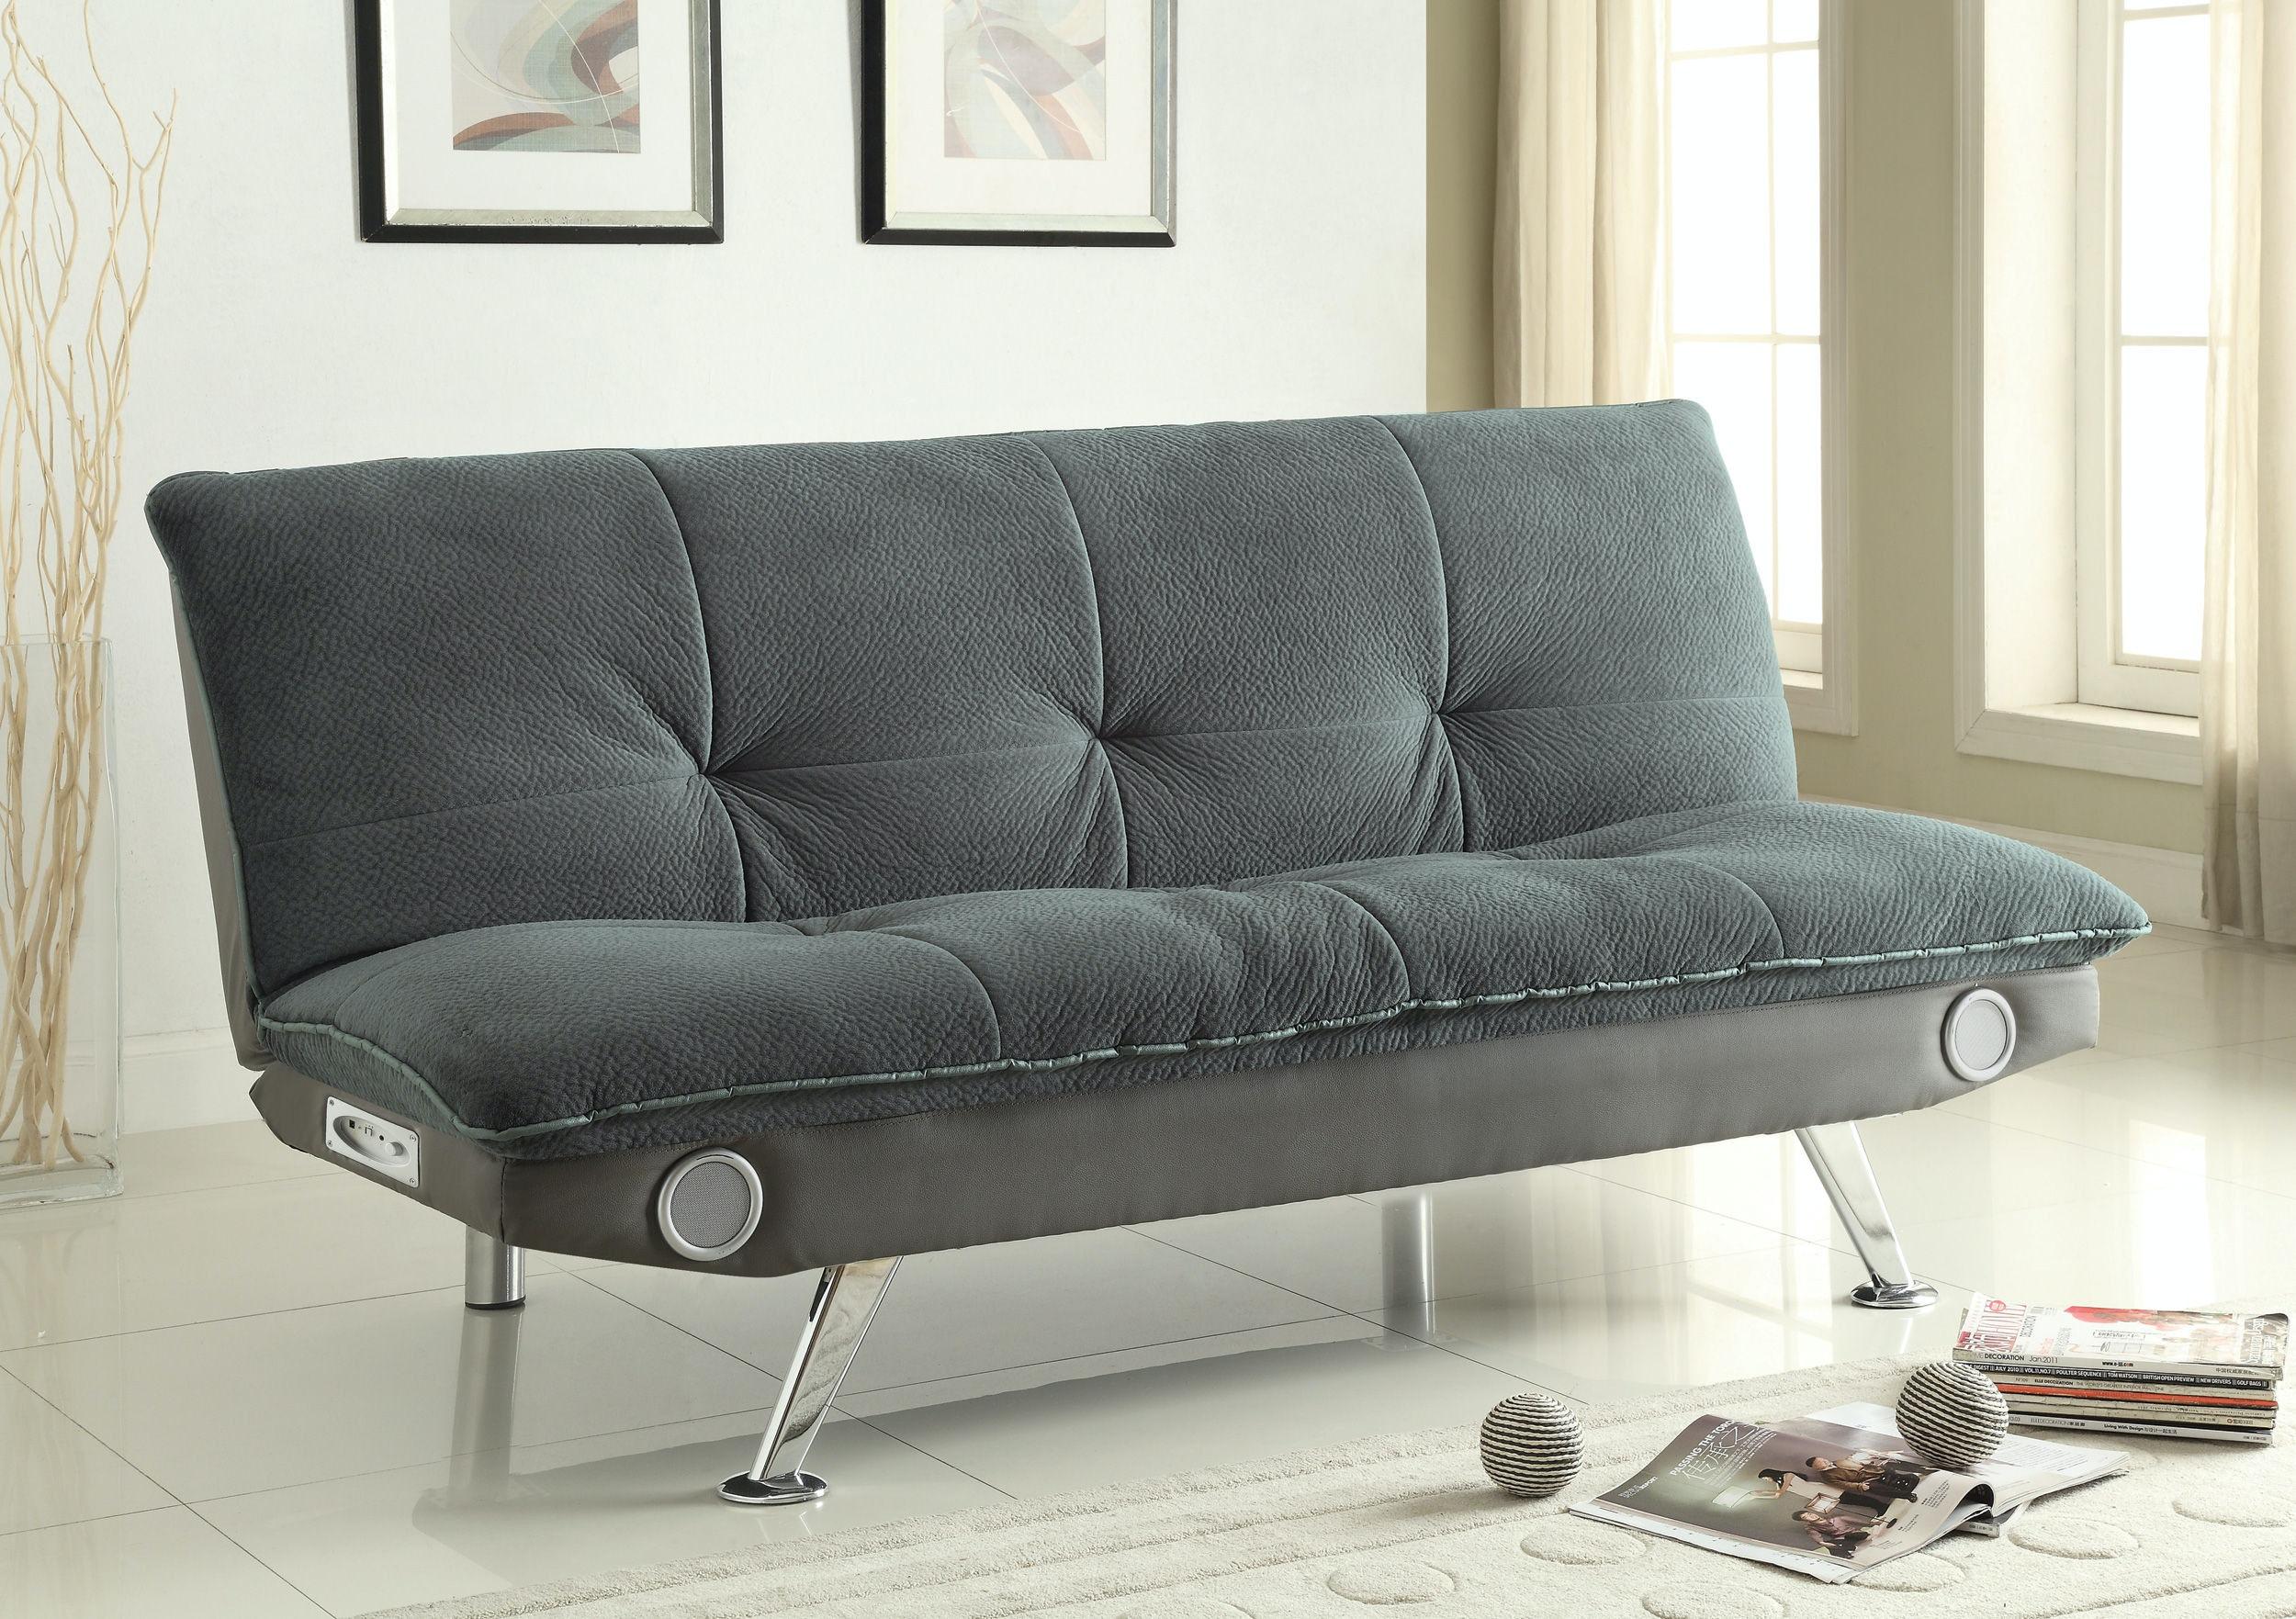 coaster living room sofa bed 500046 gallery furniture of central rh shopgalleryfurniture com